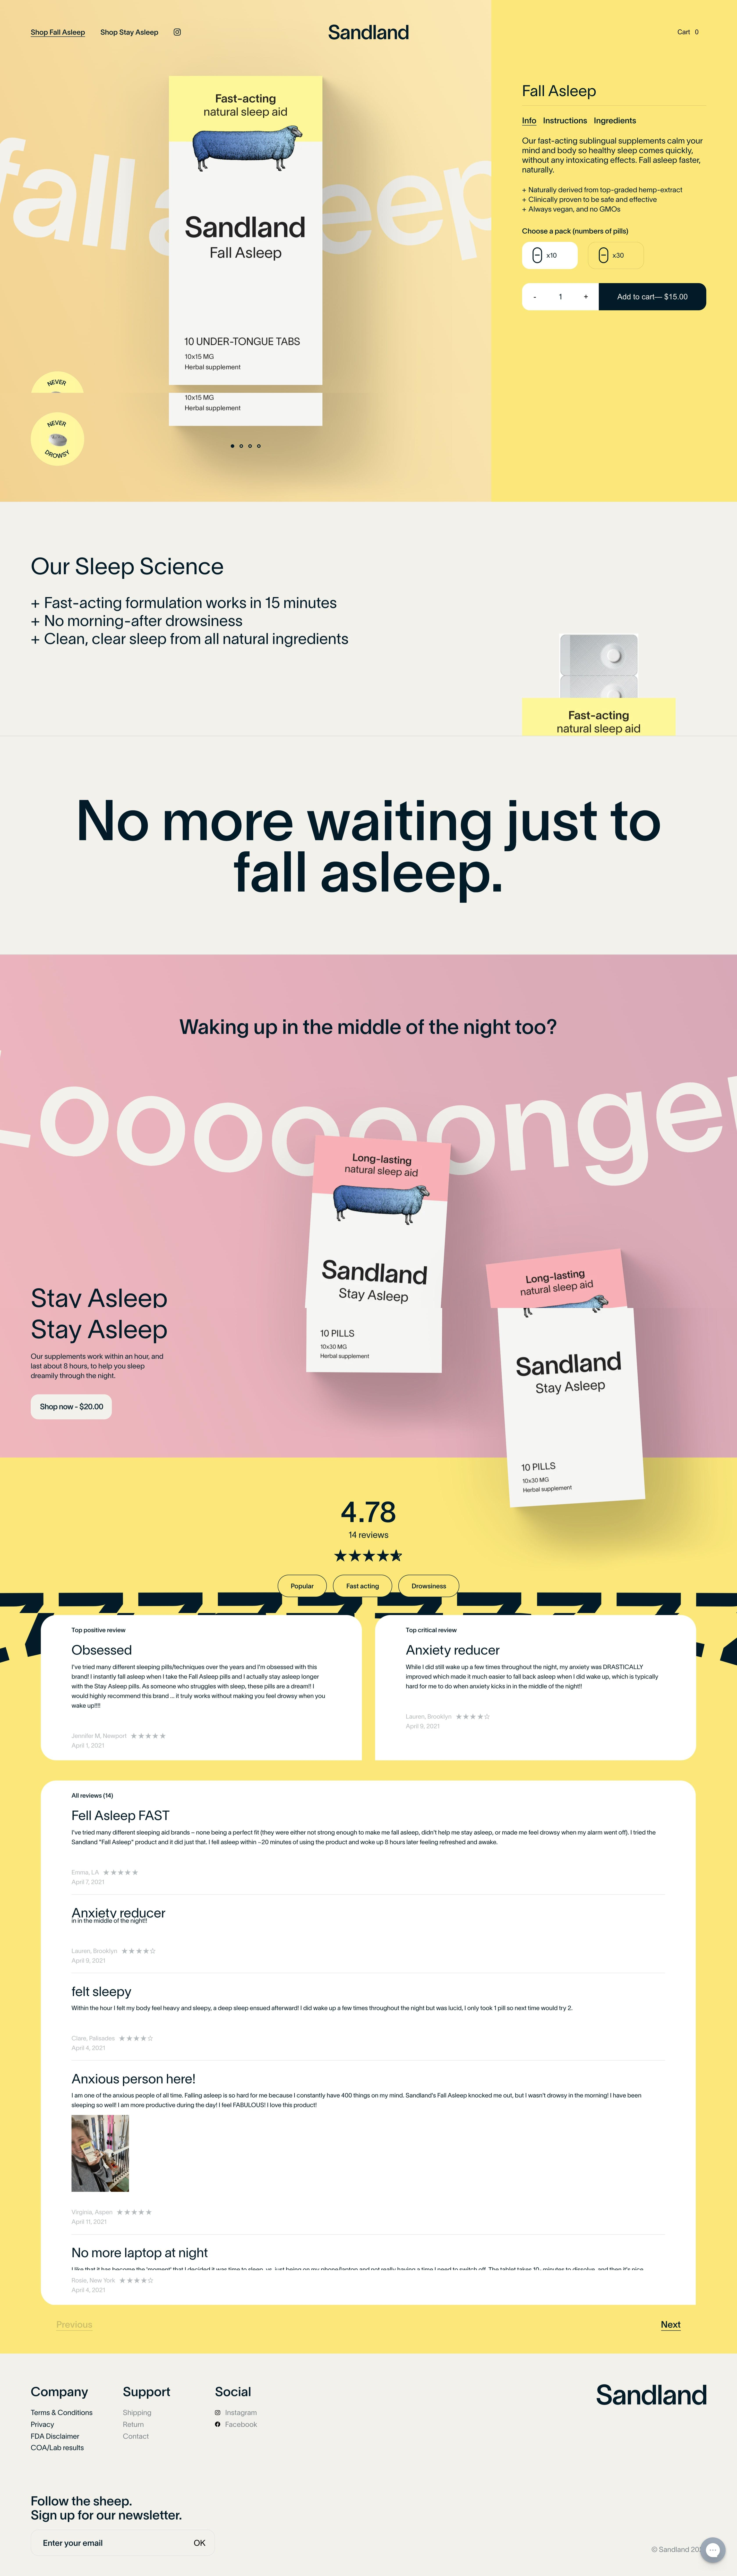 Sandland Sleep product page